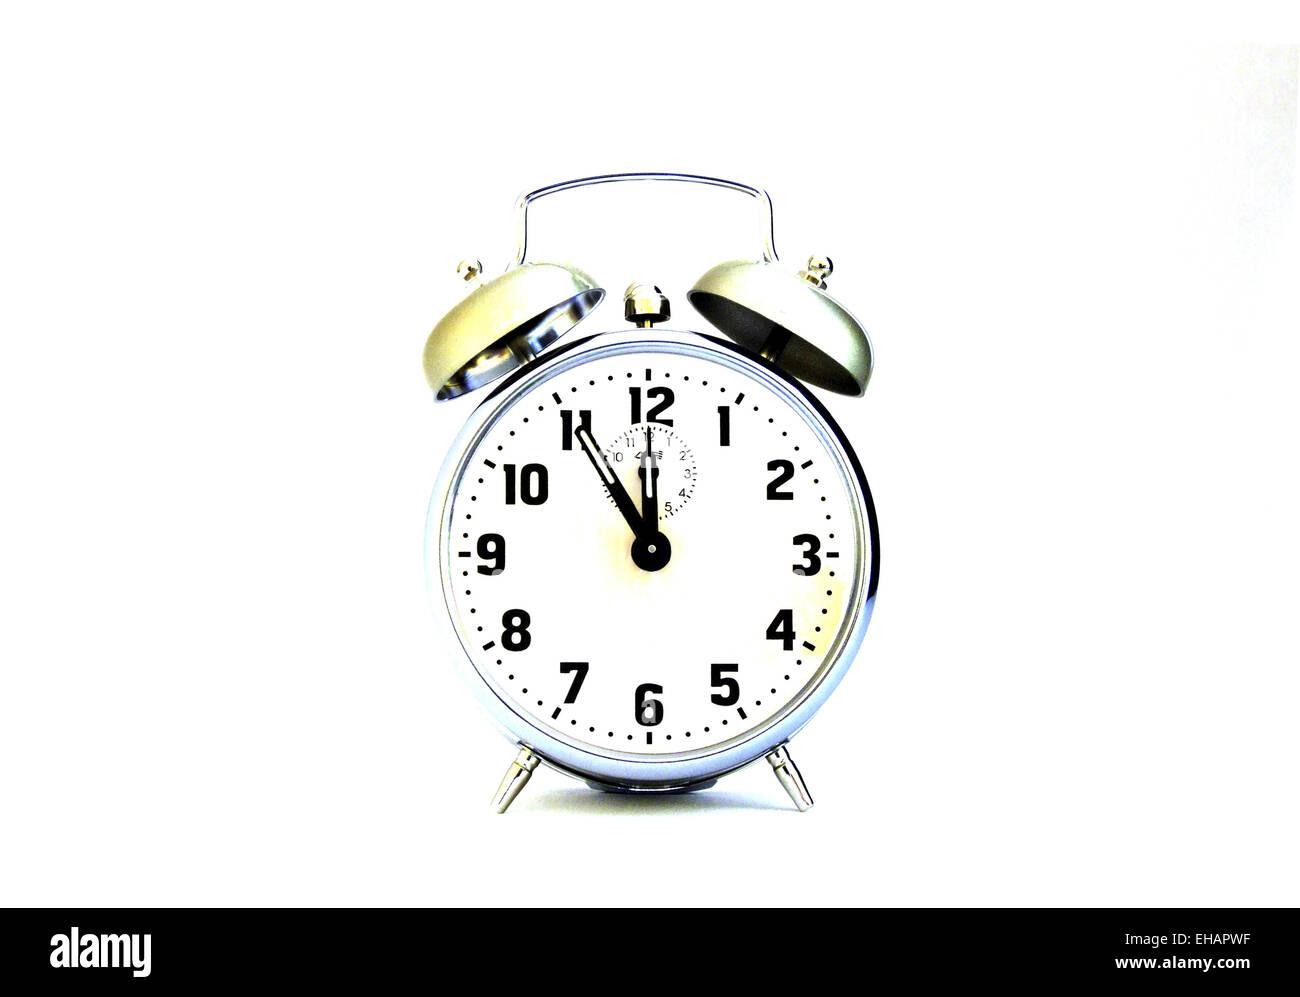 Wecker / alarm clock - Stock Image